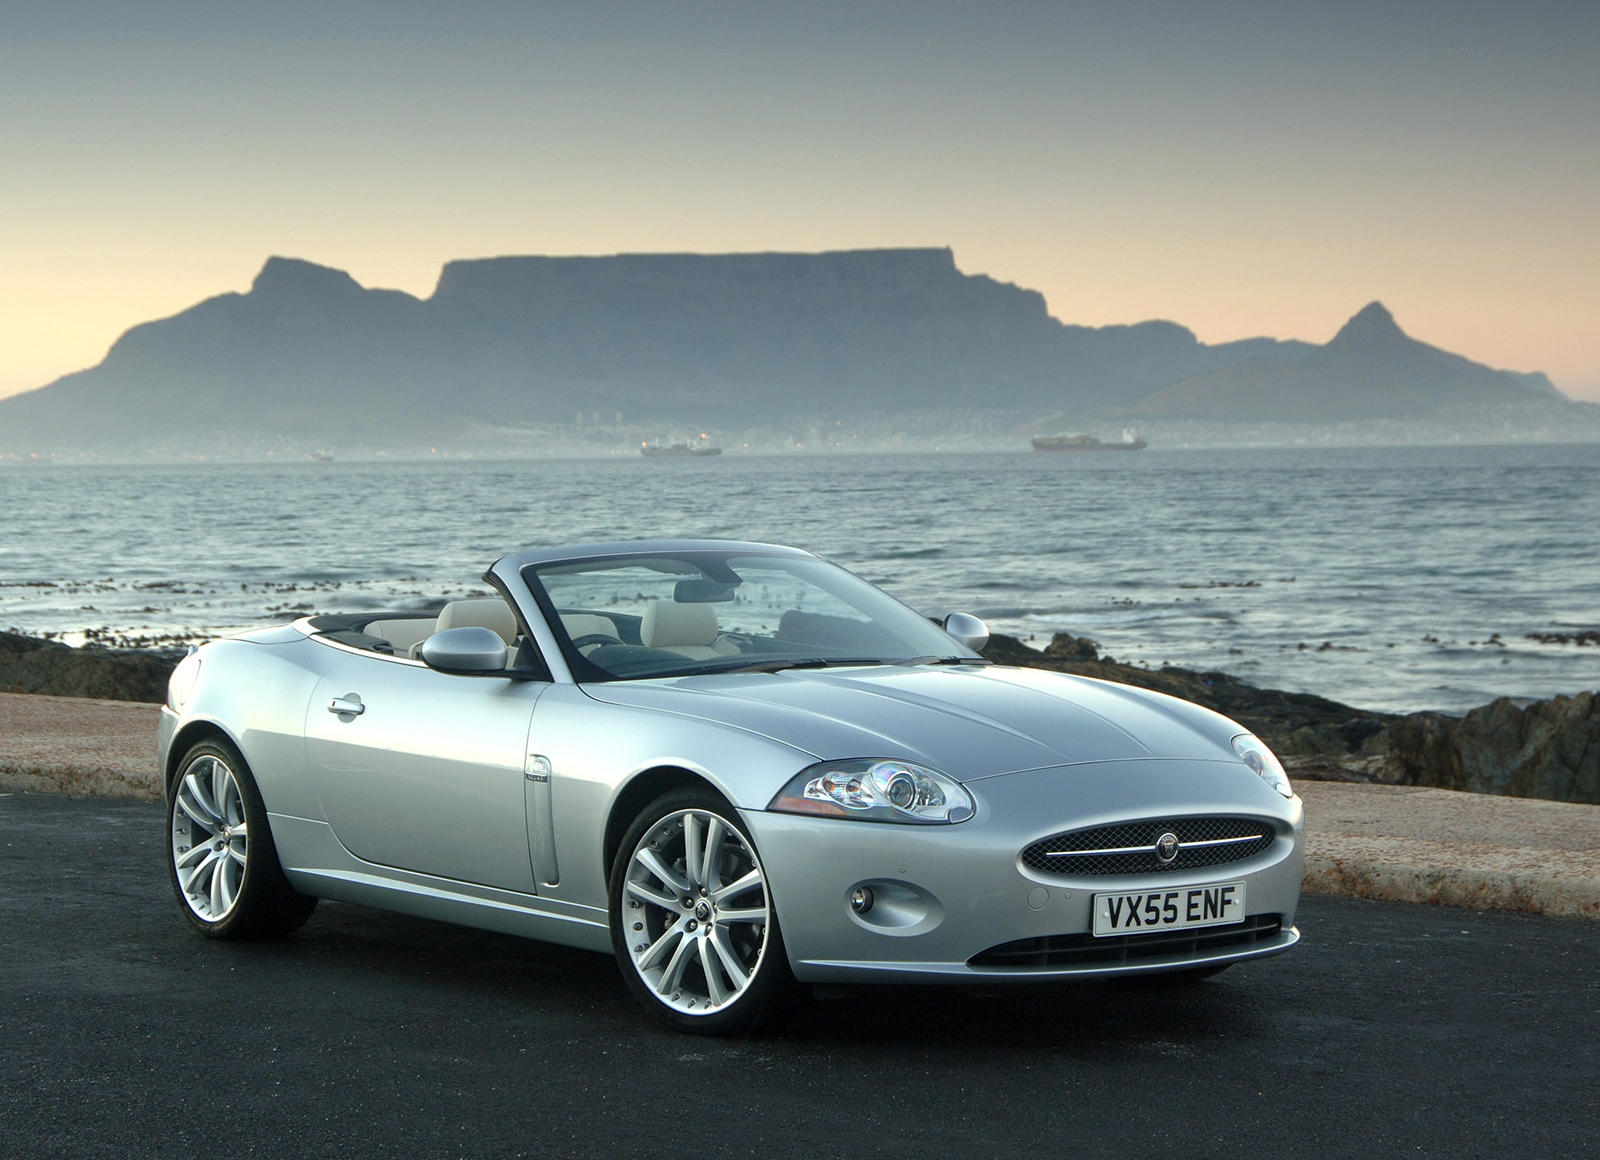 2010 Jaguar Xk Convertible Review Trims Specs Price New Interior Features Exterior Design And Specifications Carbuzz